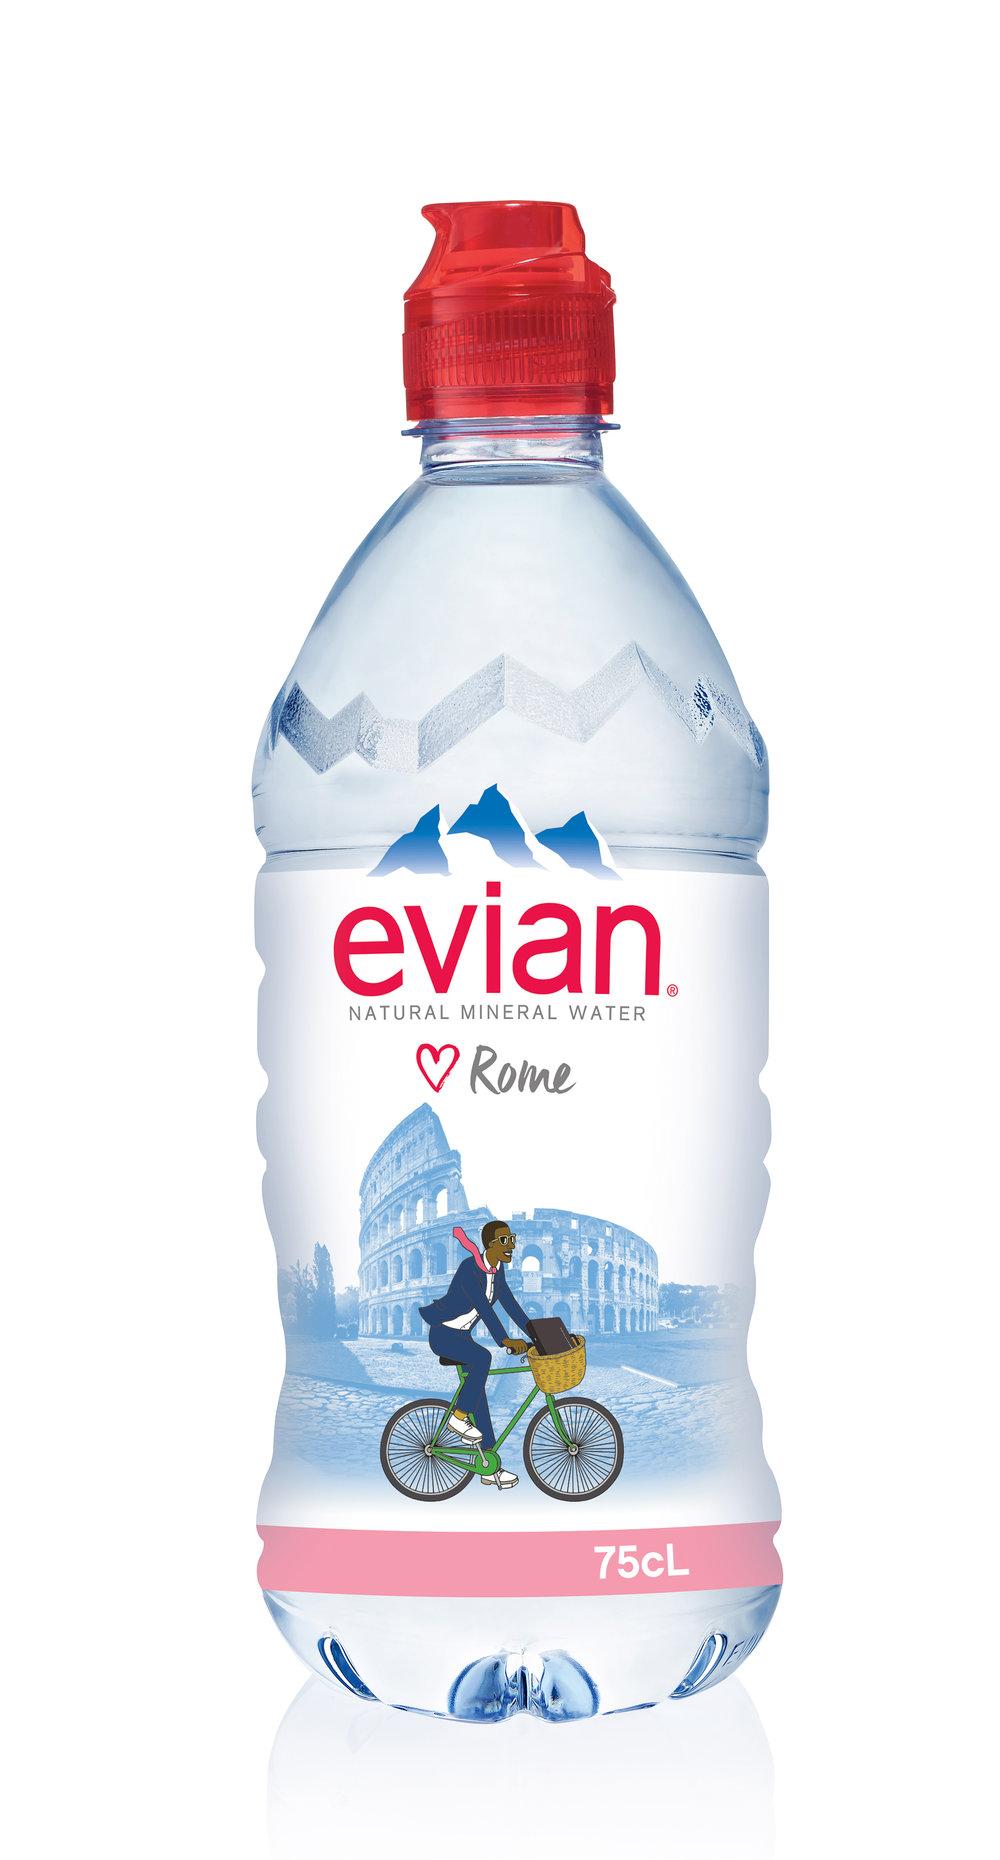 Evian_Cities_Bouteille_MAC_Europe75CL-HD_Rome_02.jpg